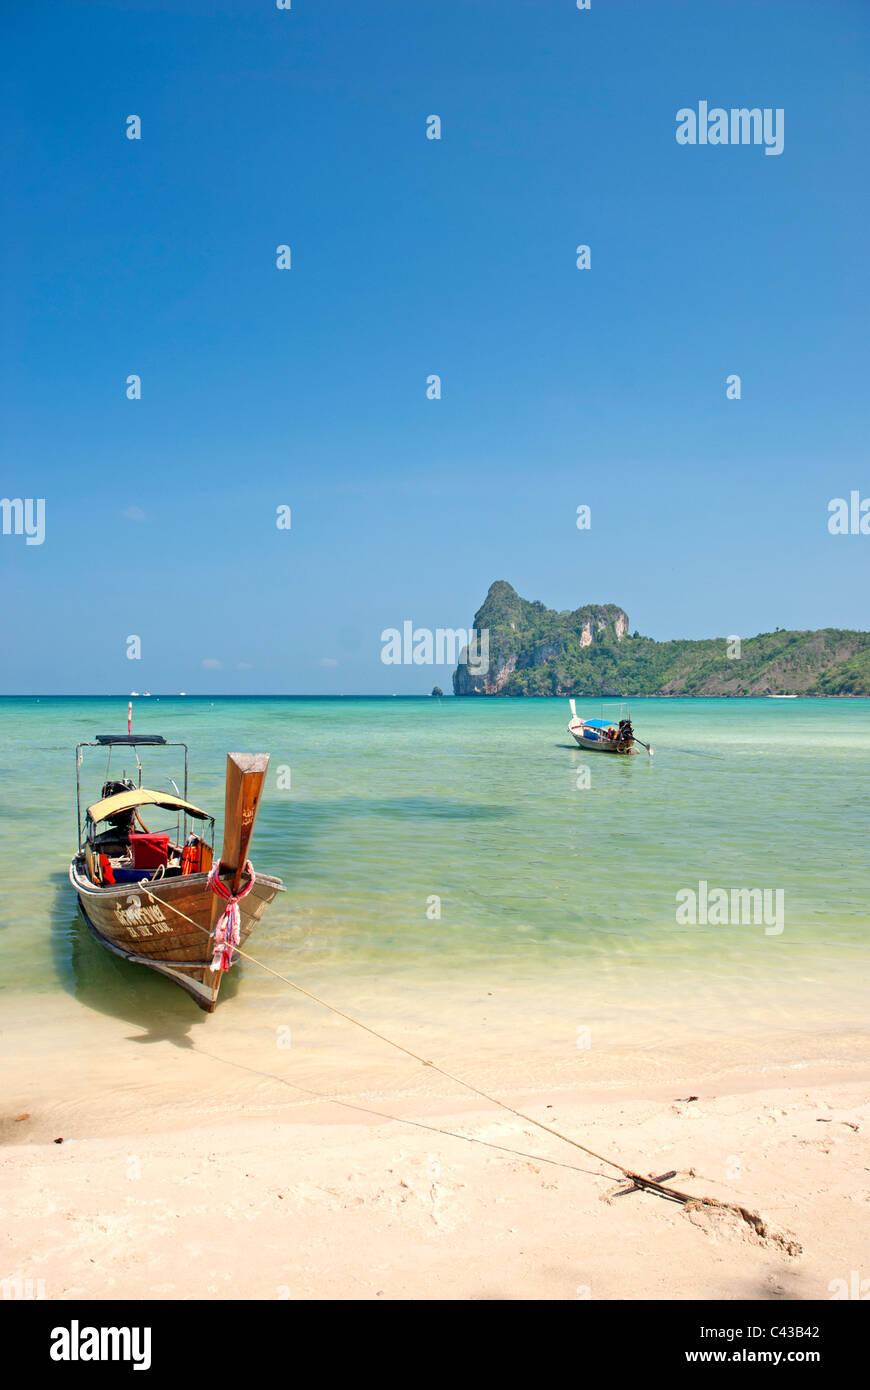 Voile on tropical beach Koh phi phi en Thaïlande Photo Stock